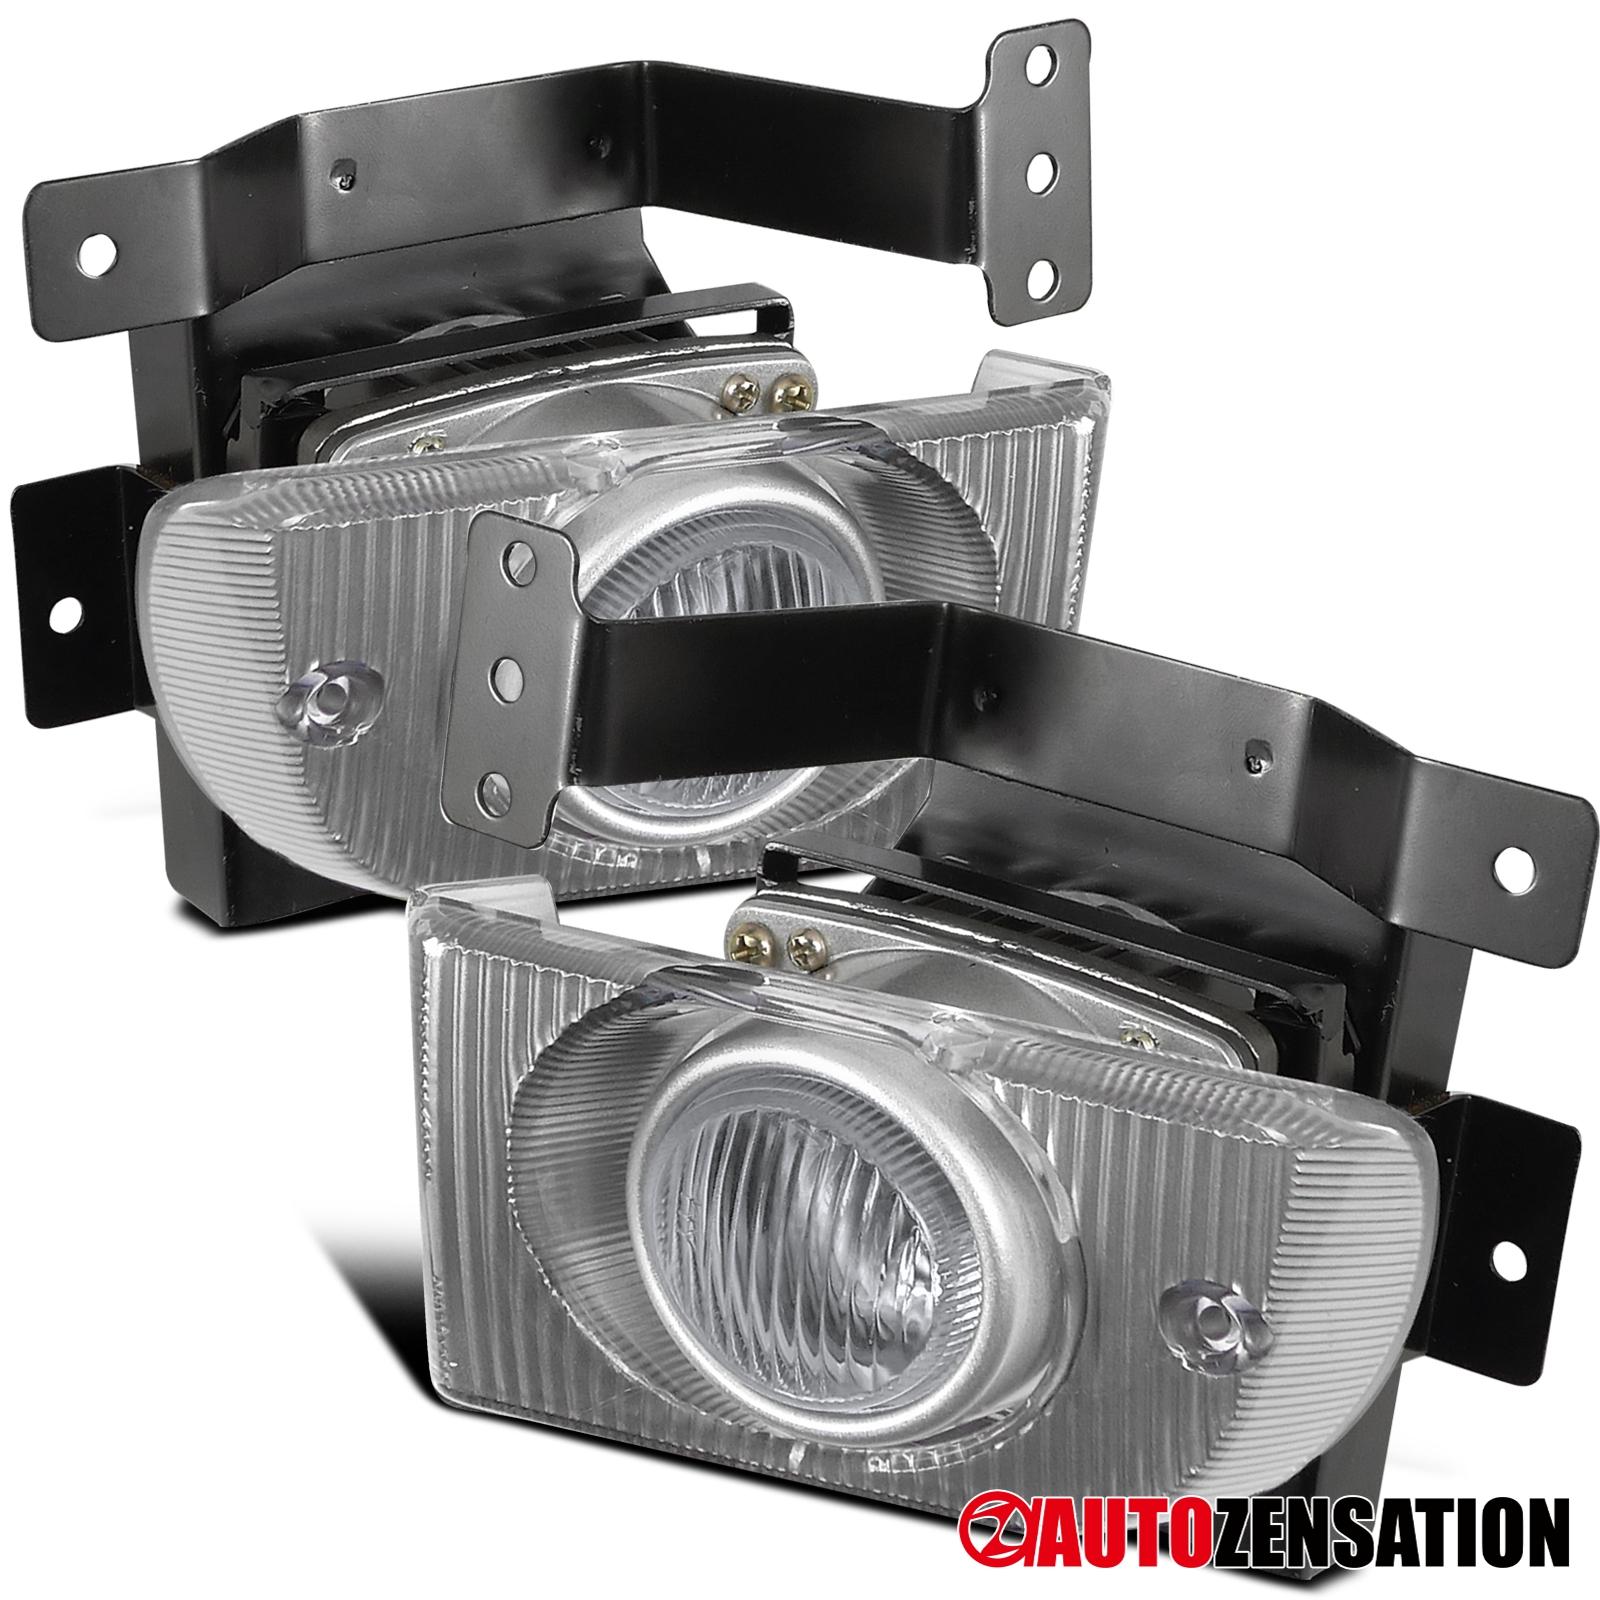 3Dr JDM Clear Lens Bumper Driving Fog Lights+Switch Fit 92-95 Honda Civic 2Dr